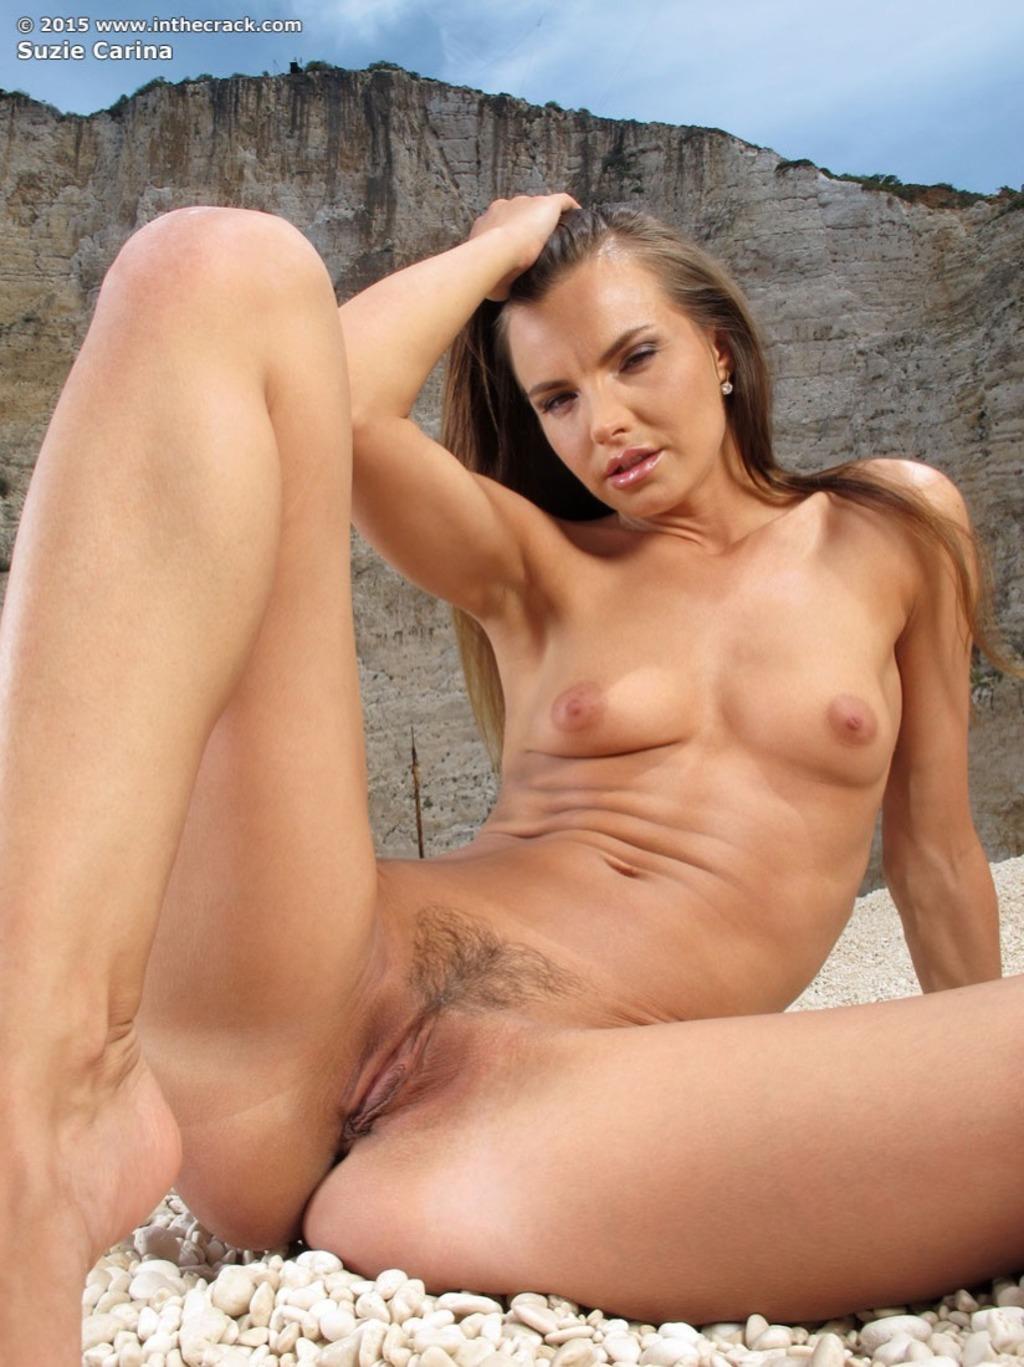 Suzie slay naked xxx pics